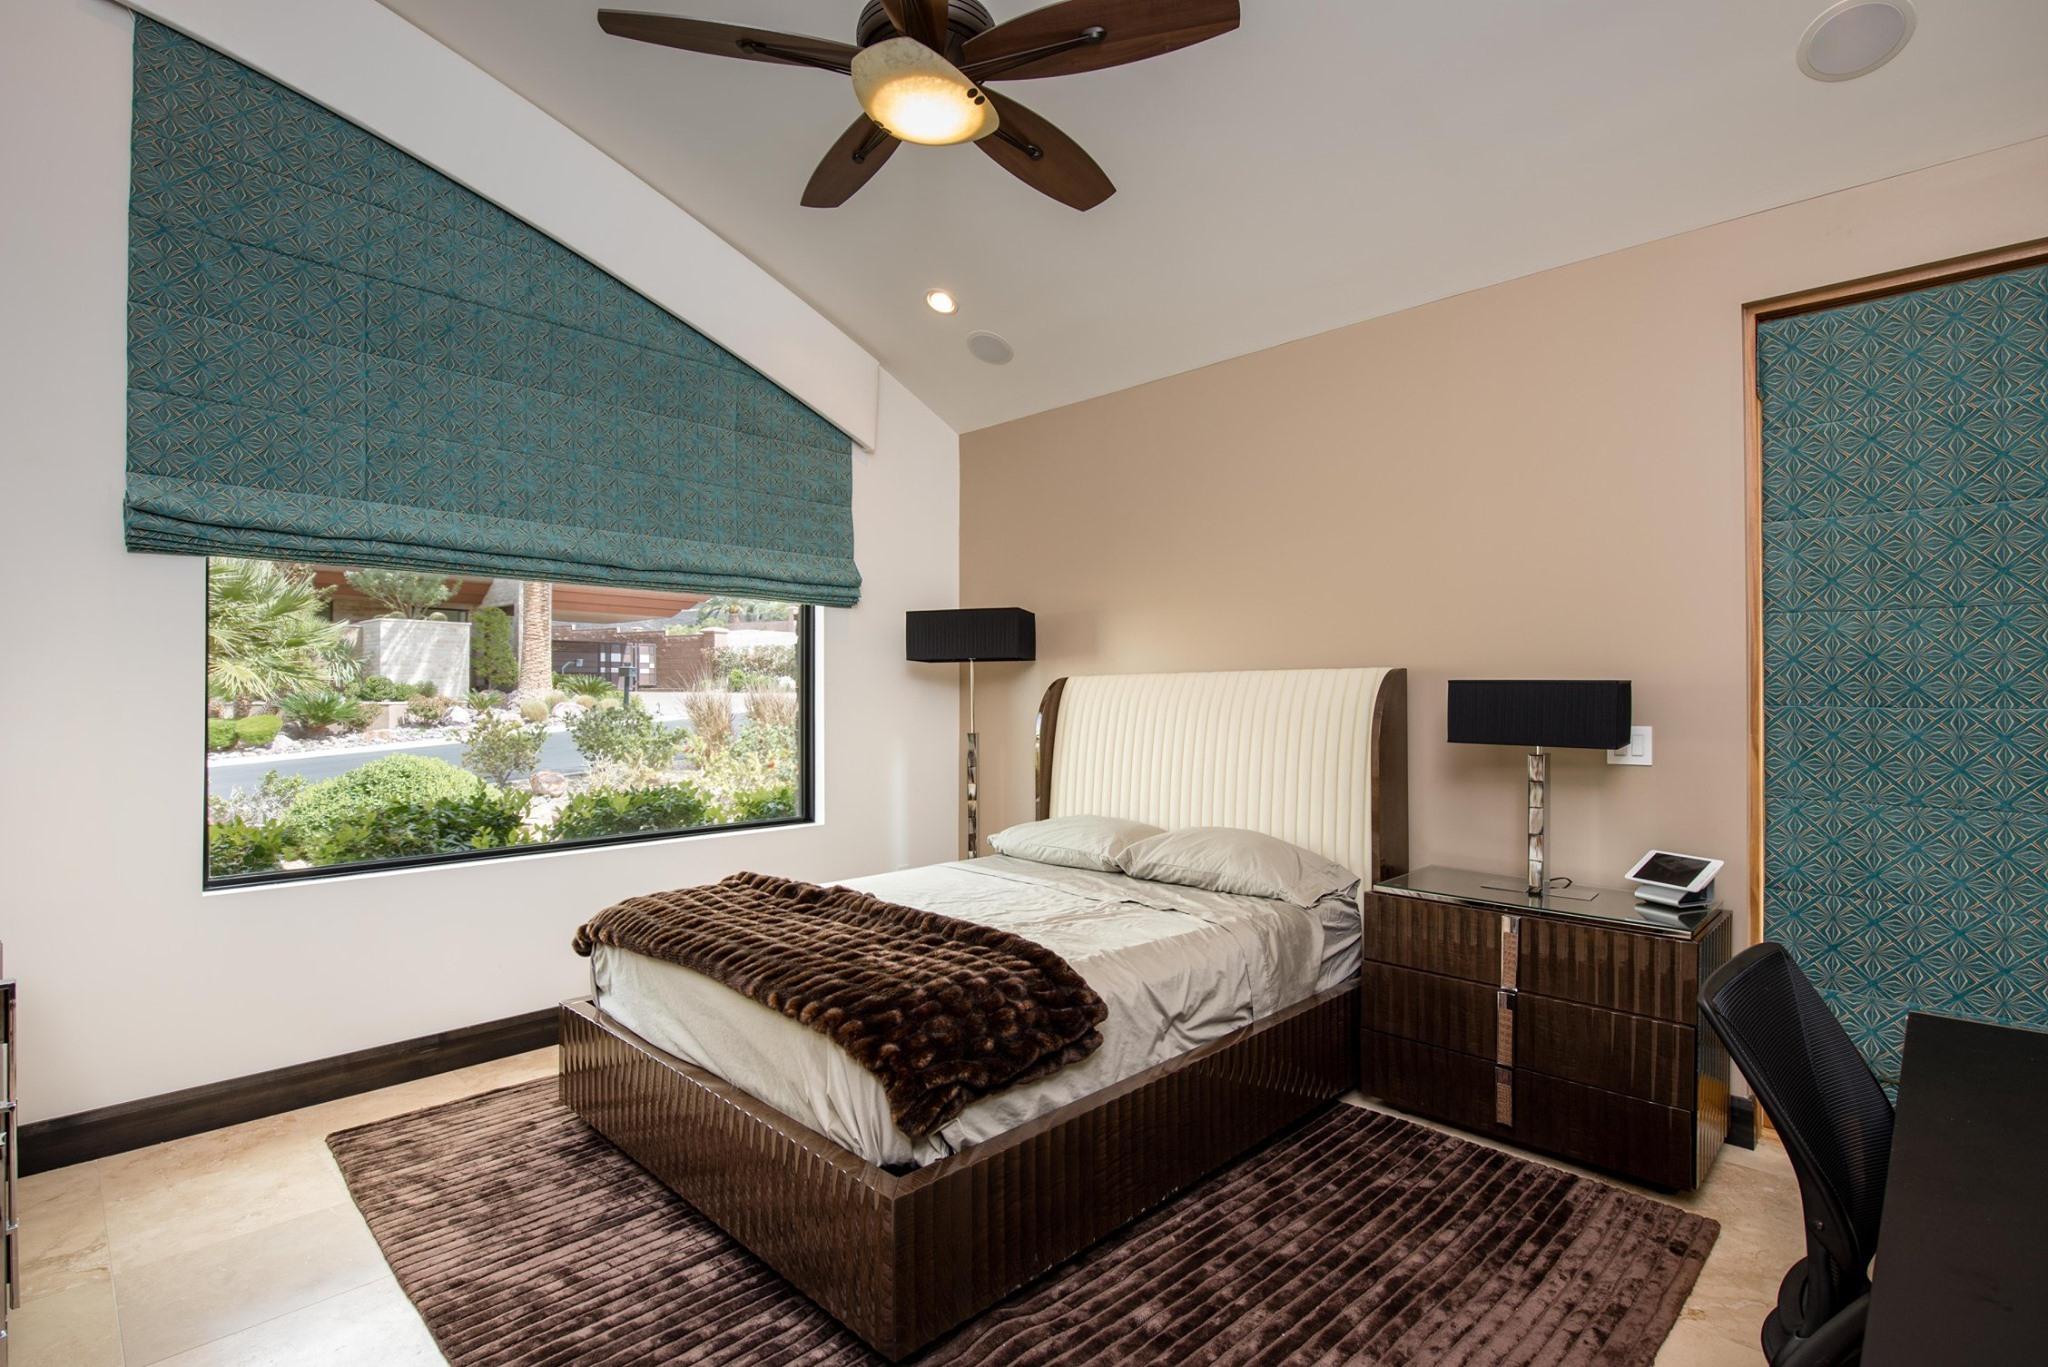 Cantoni Modern Furniture – Natural Talalay Latex Pillow Store In Irvine California